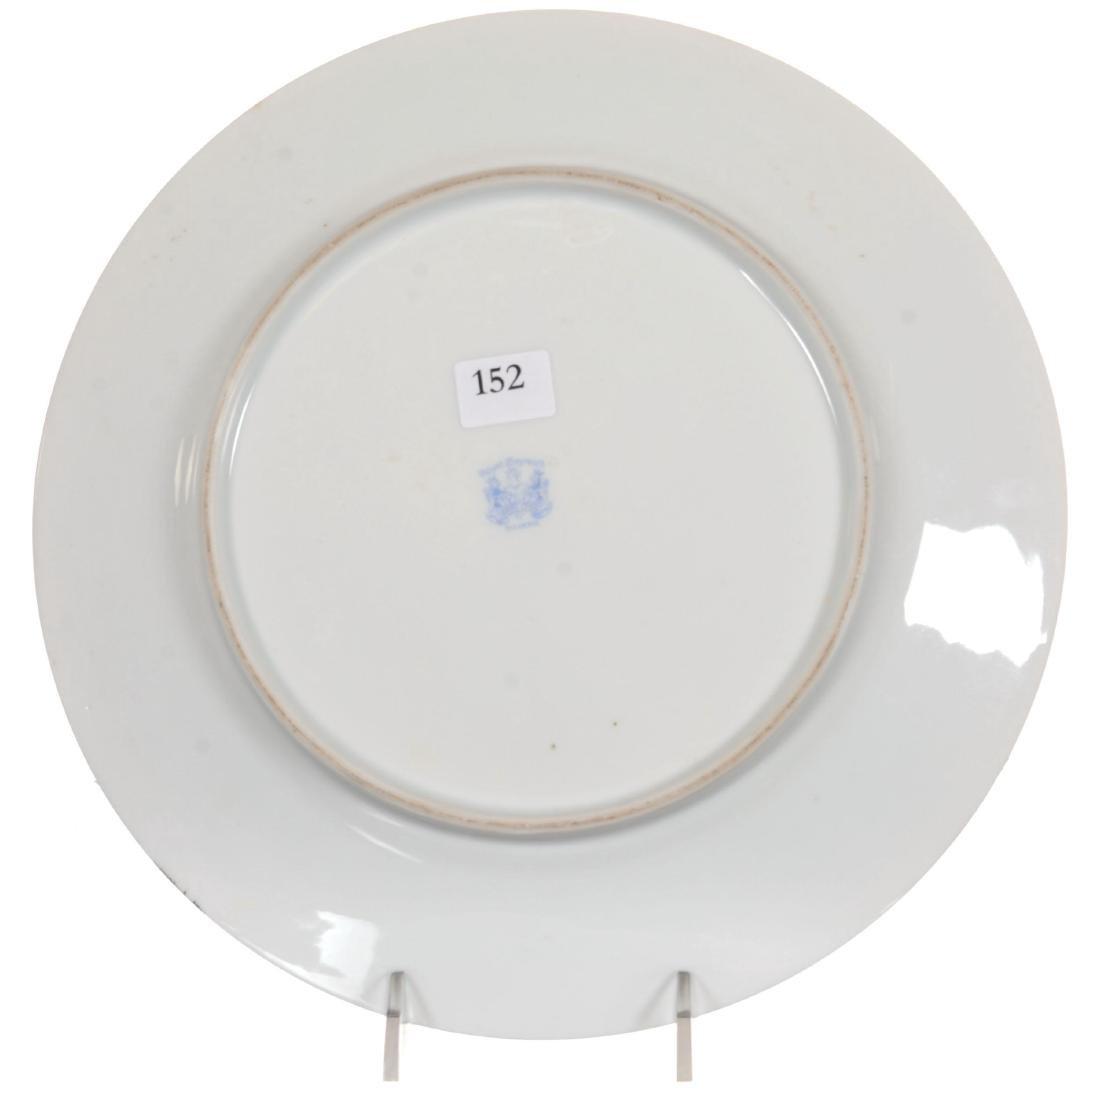 Royal Bayreuth Plate - 2